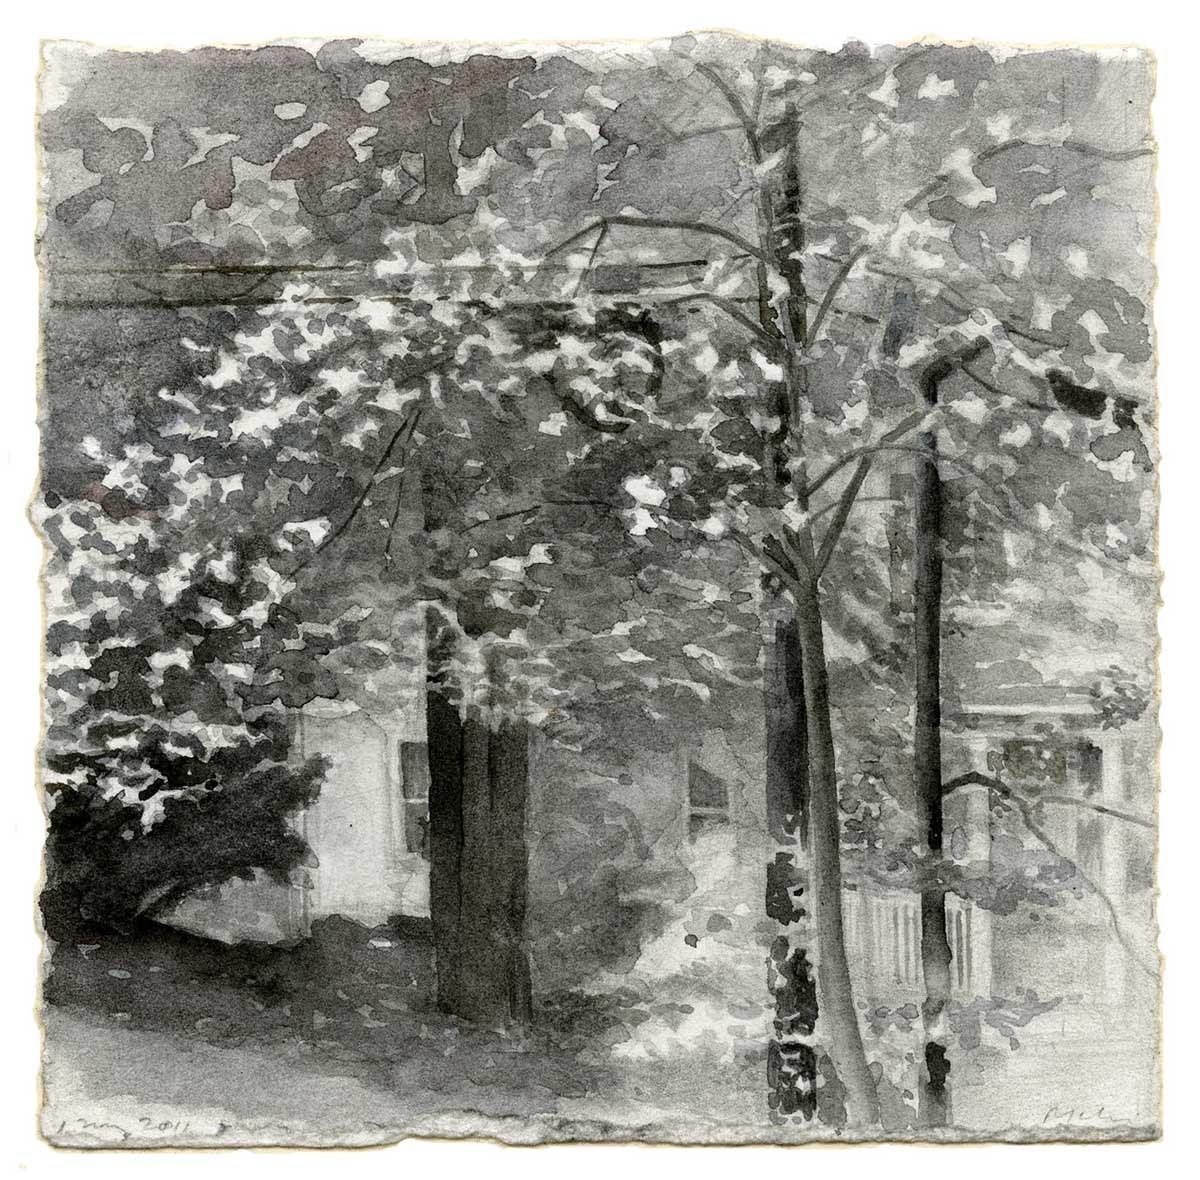 Dogwood Blossoms: 1 May 2011 image